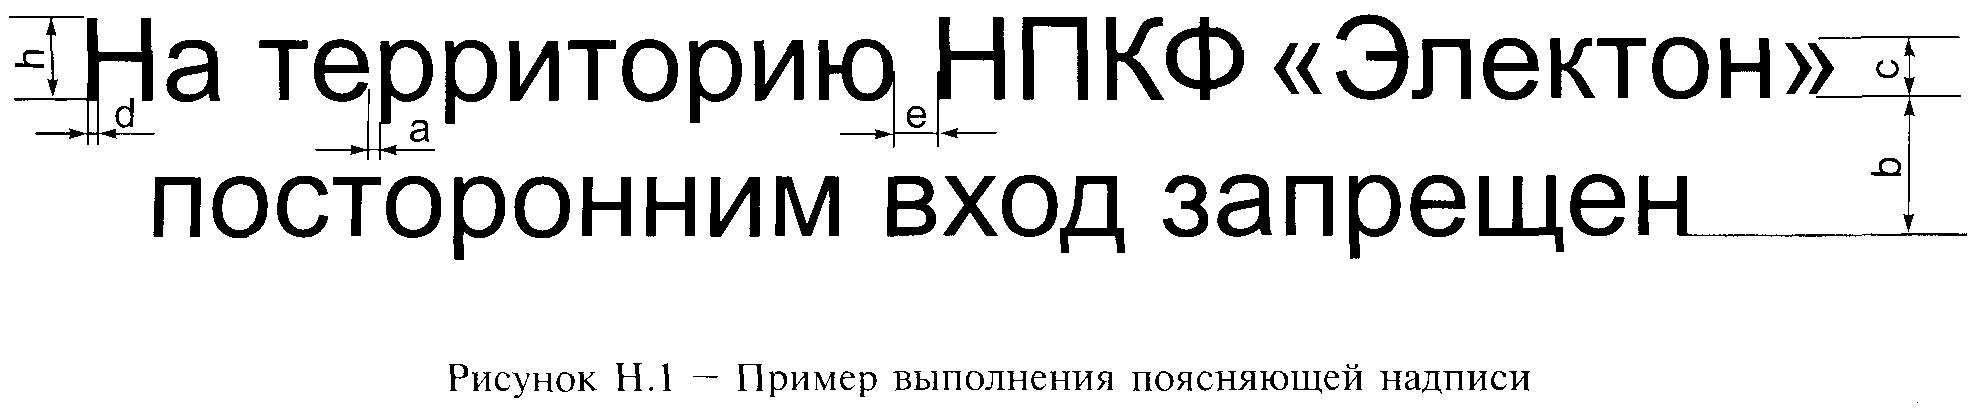 РИСУНОК Н.1. К ГОСТ Р 12.4.026-2001